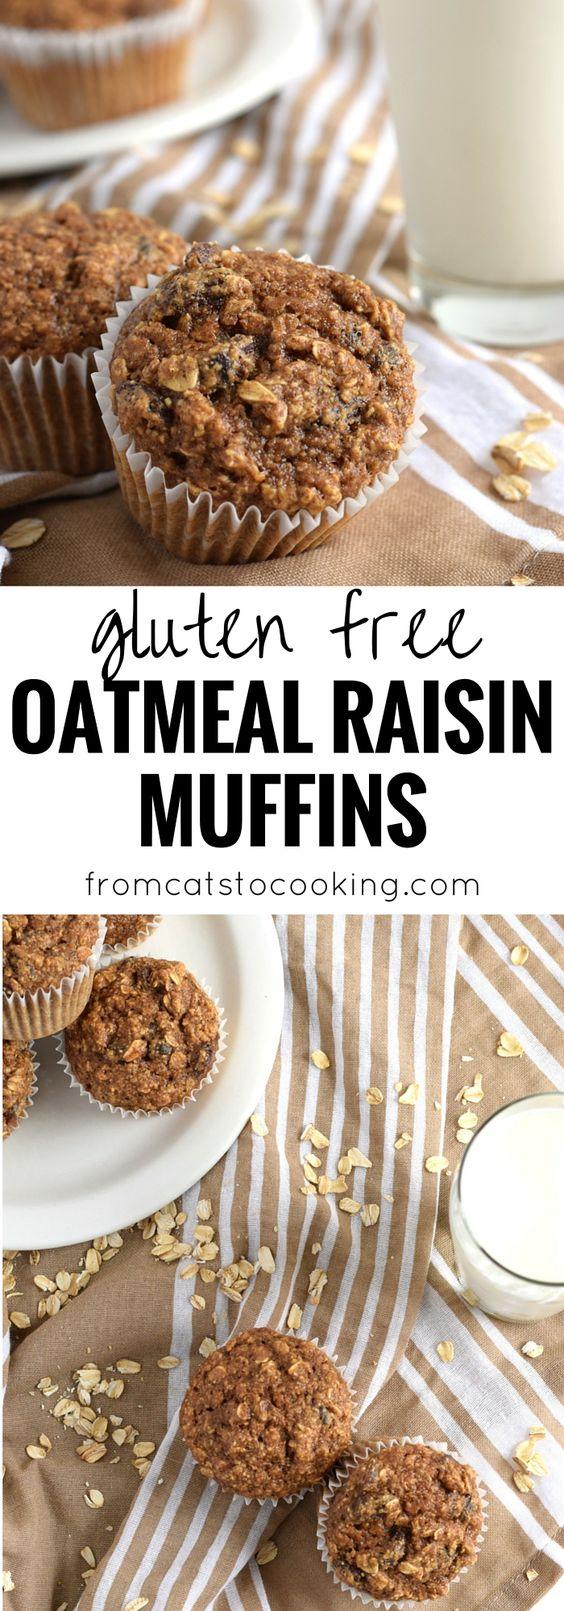 Oatmeal raisin muffins, Raisin muffins and Gluten free oatmeal on ...